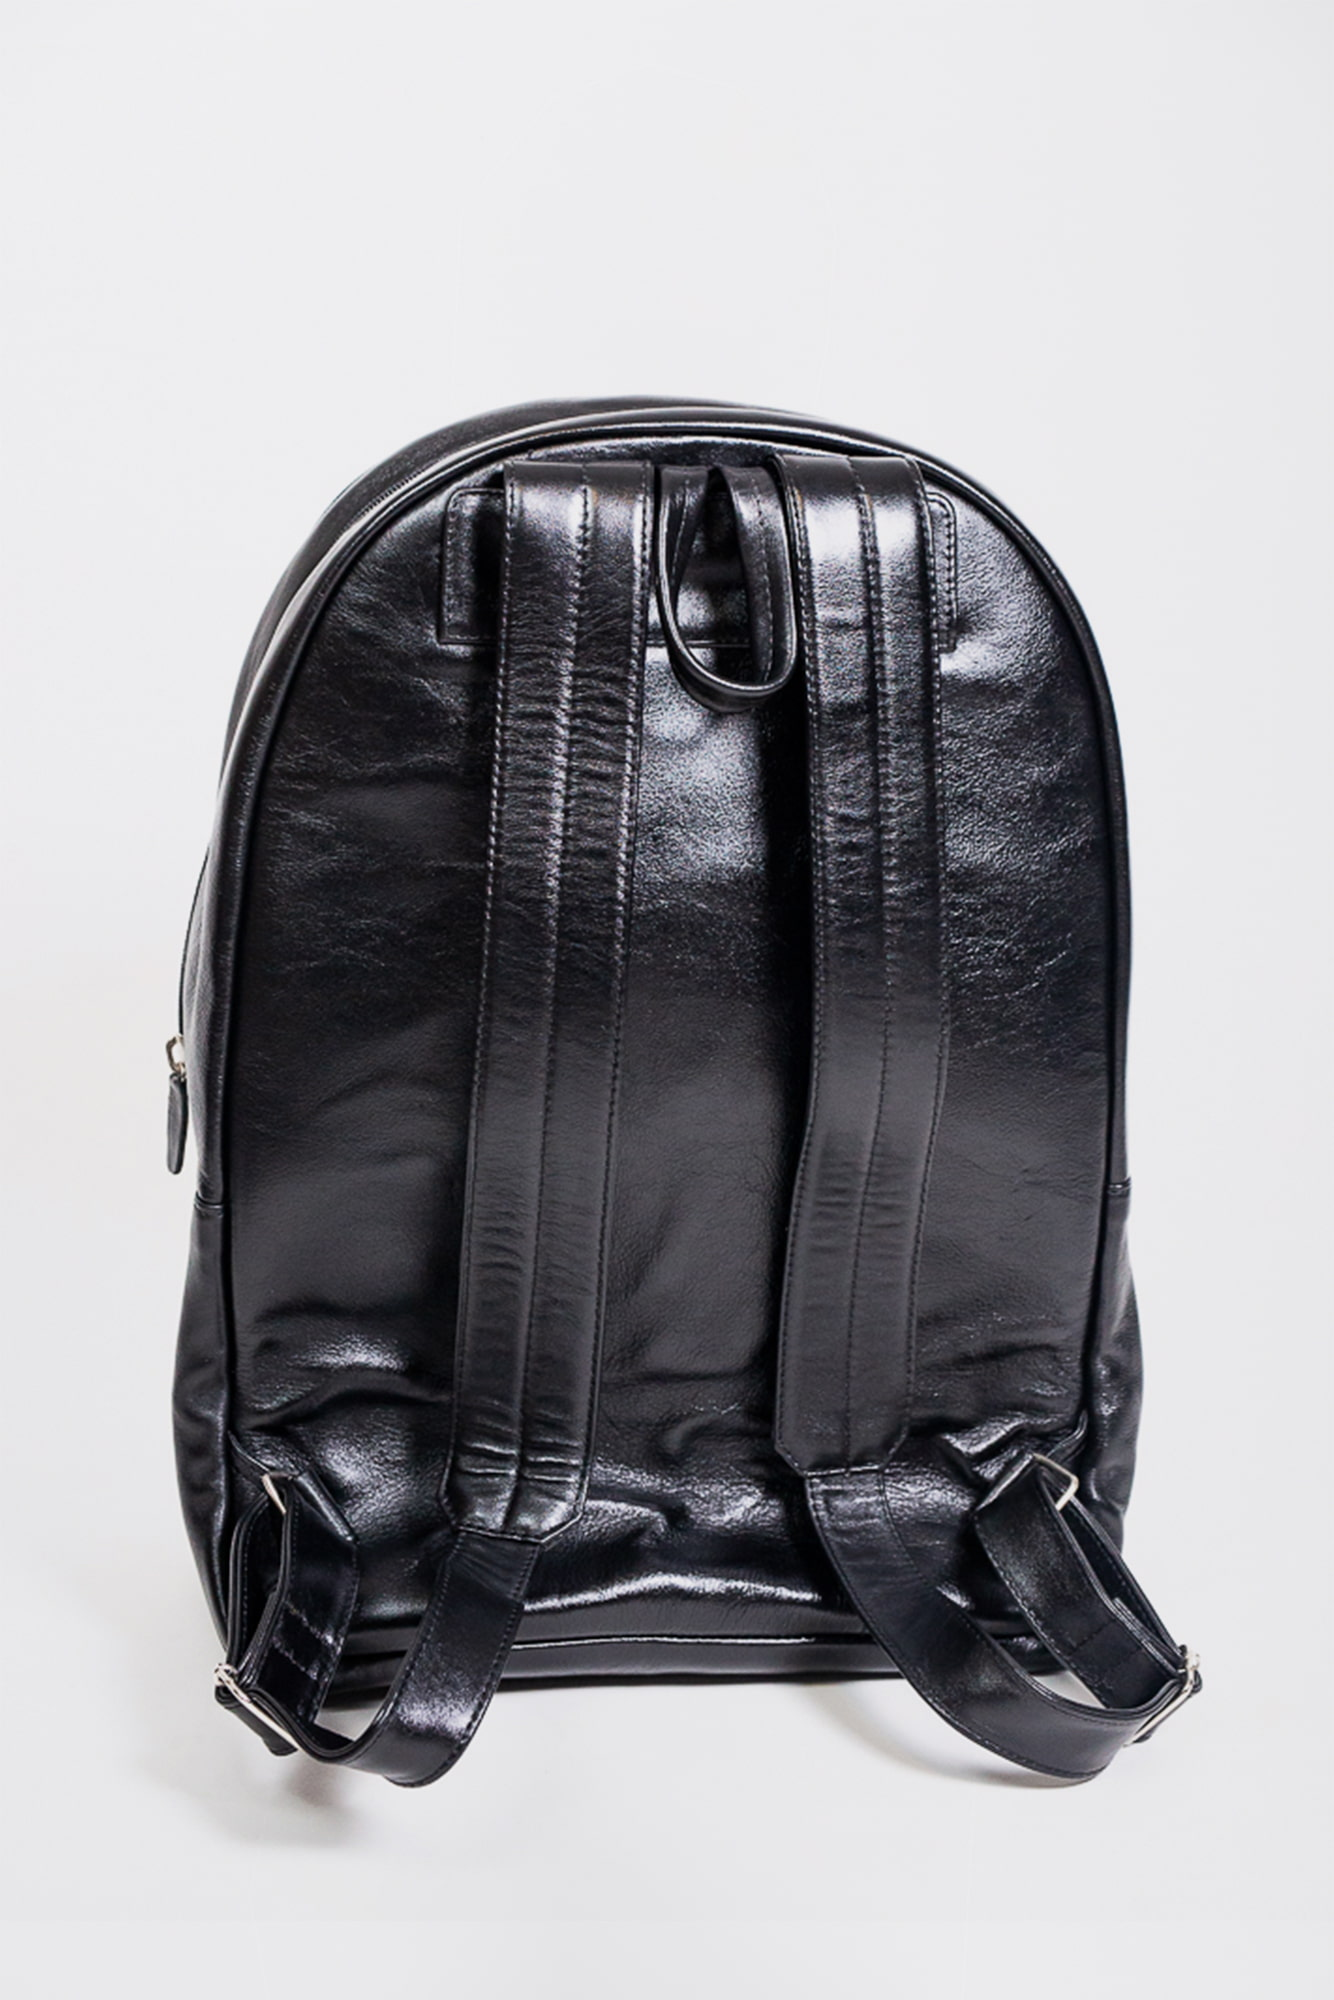 Mochila Urbô Leather Paris Black